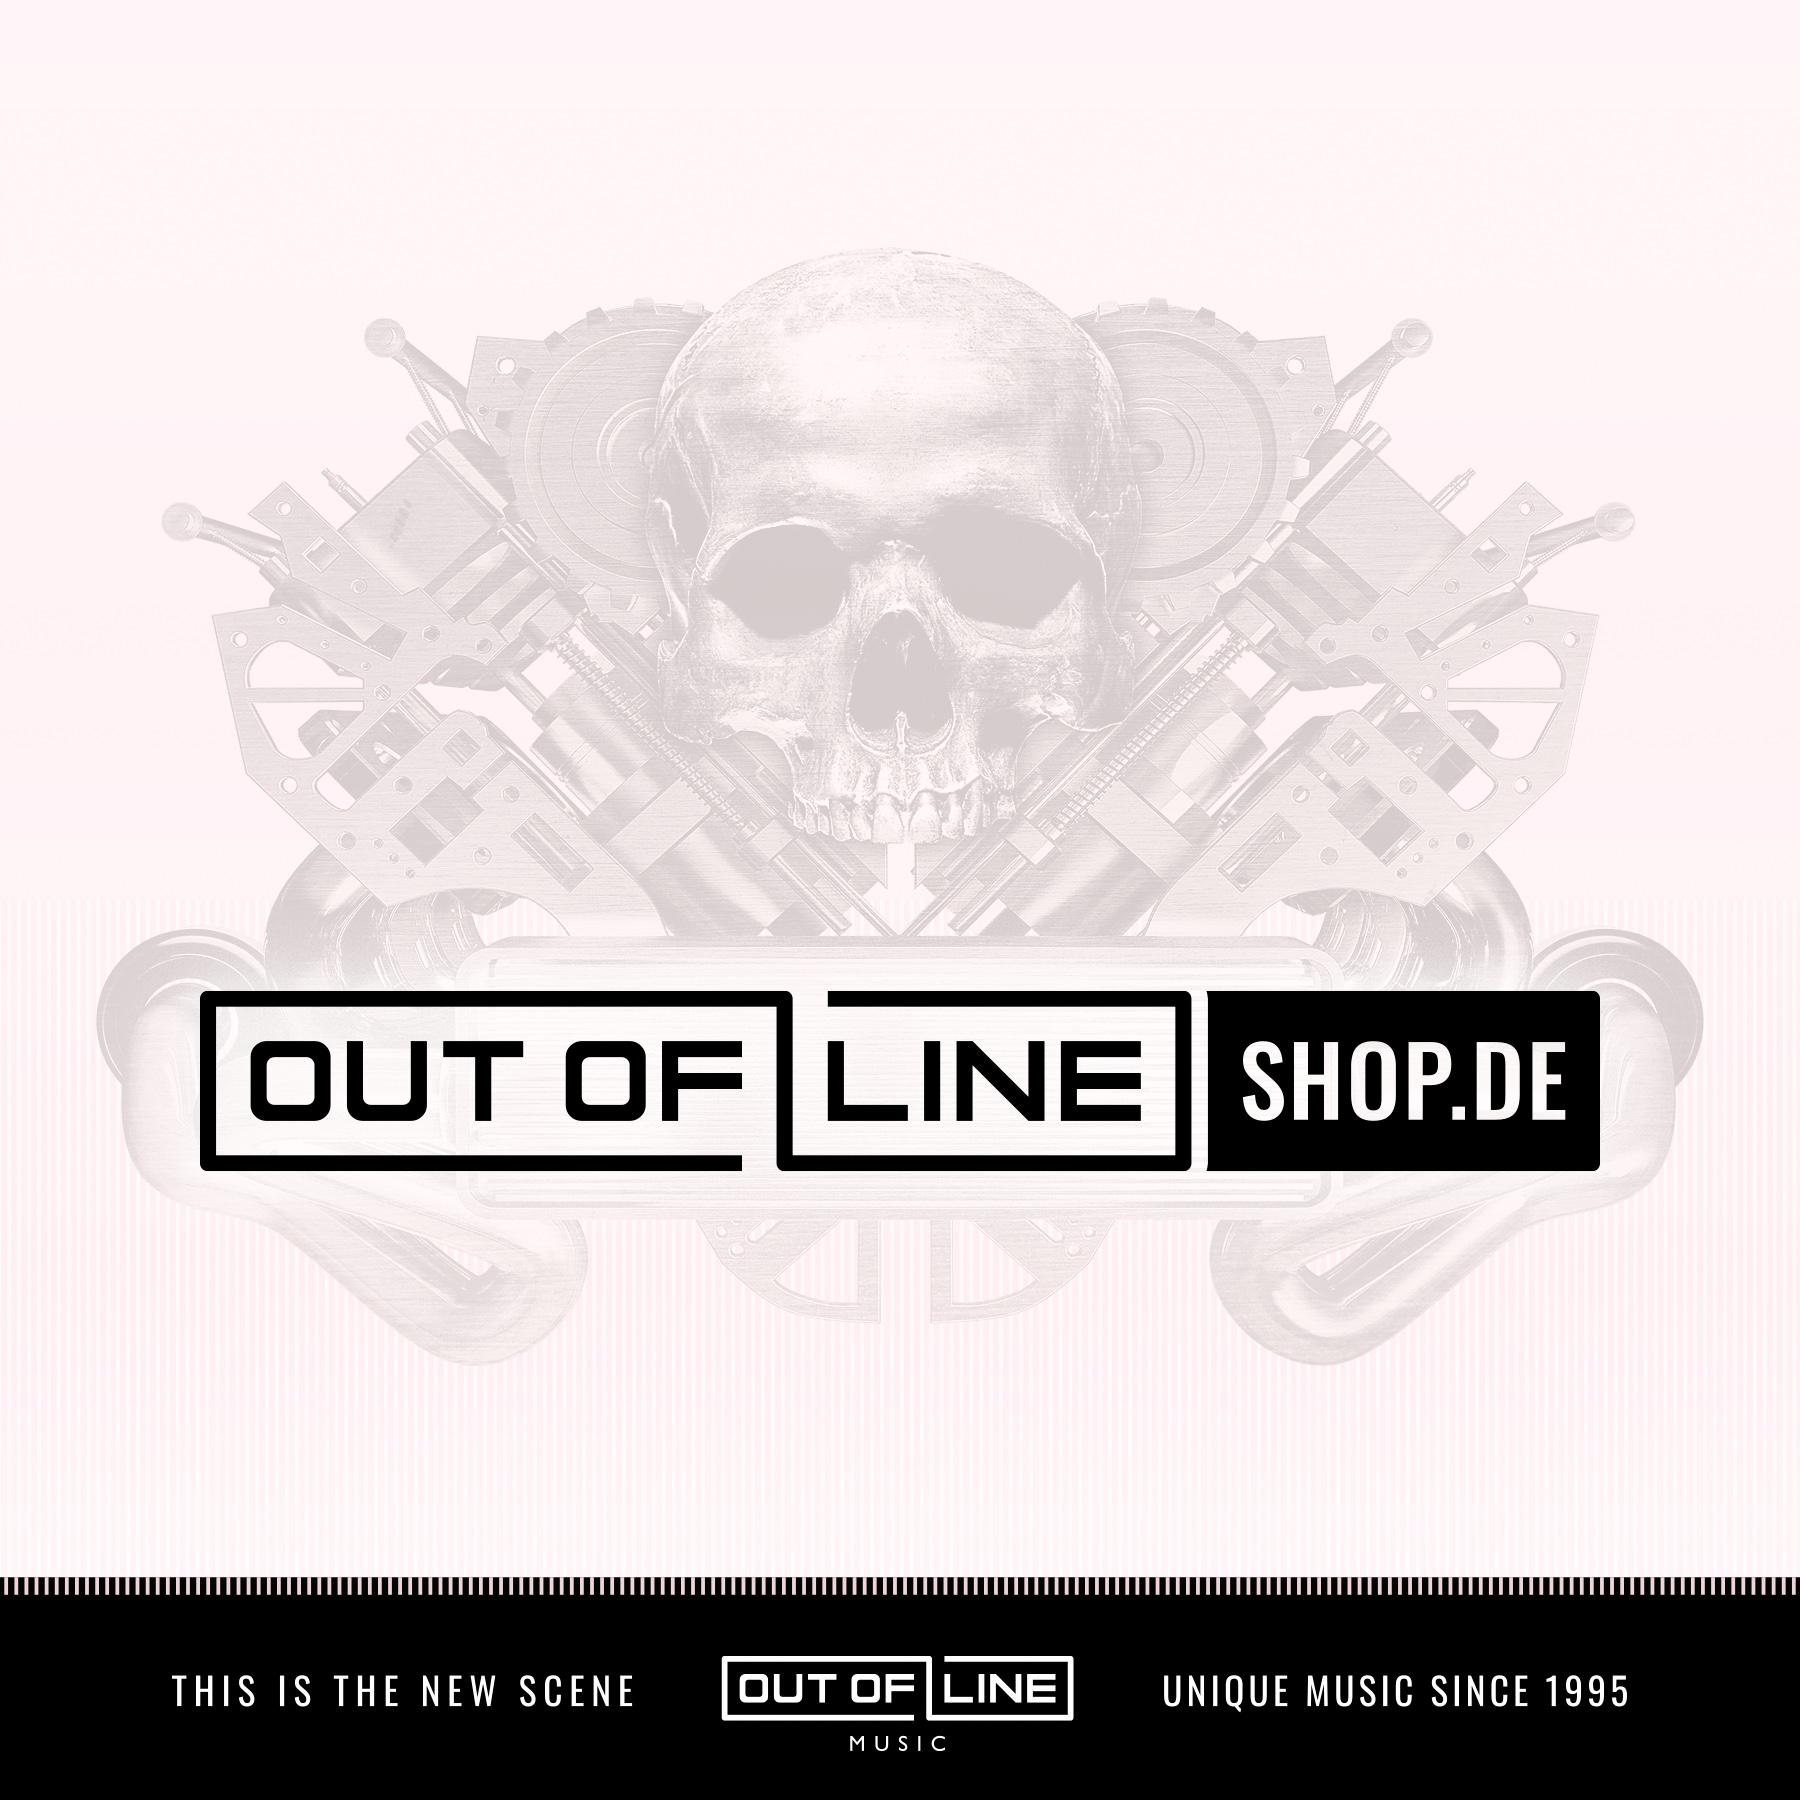 V.A. - Guitars & Machines Vol.4-Dark Side Of The 80s - 2CD